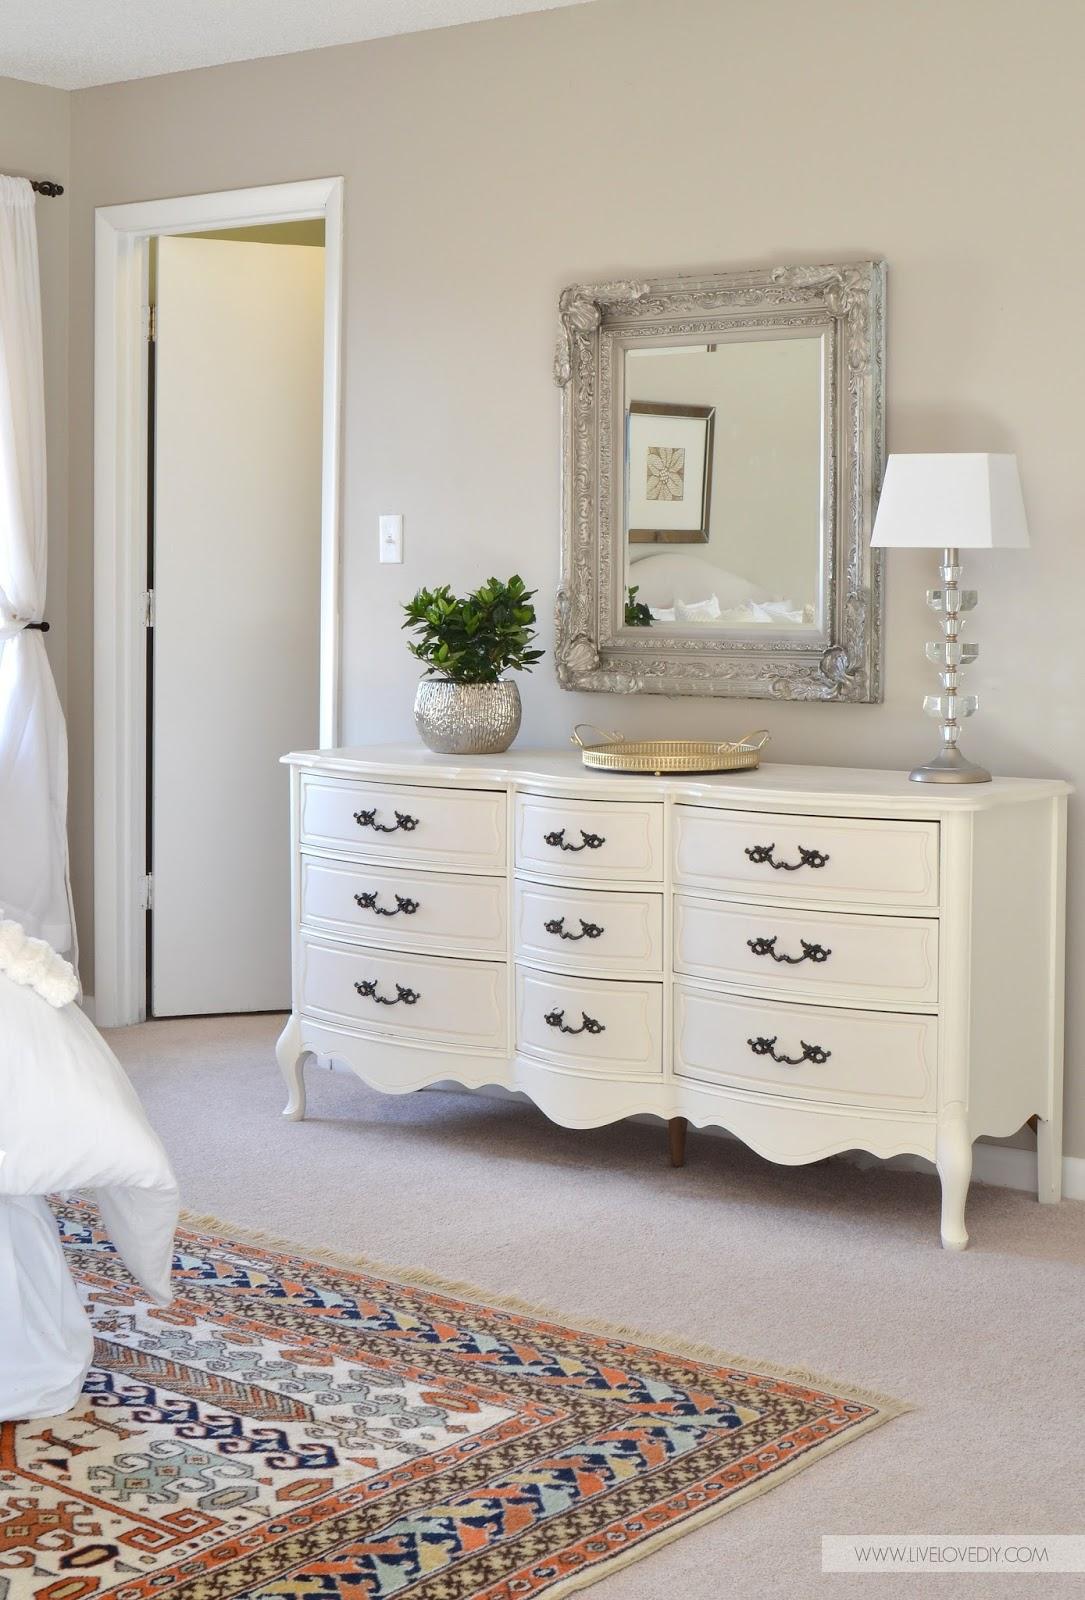 LiveLoveDIY: DIY Decorating Ideas for Your Bedroom